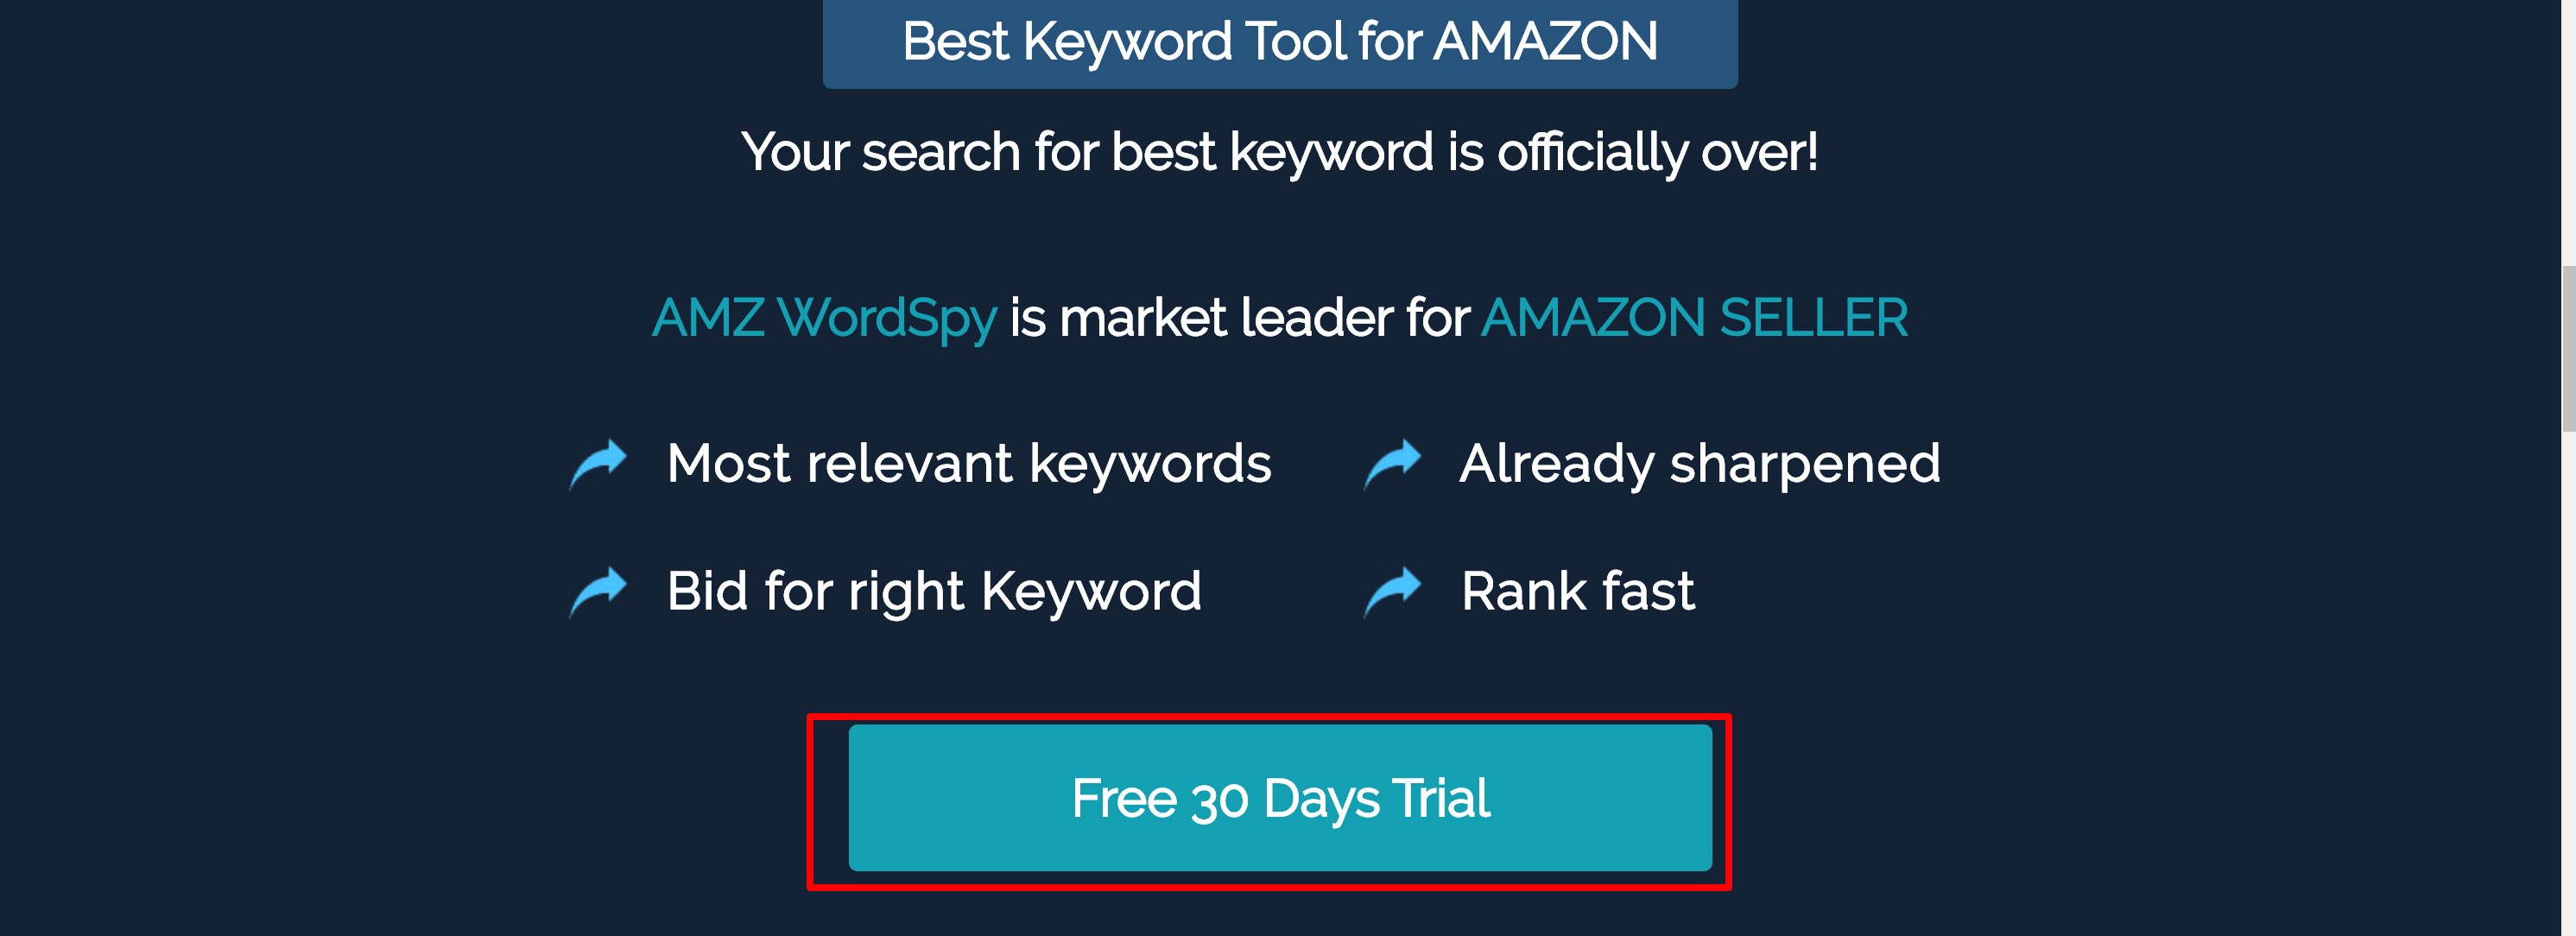 AMZ Wordspy pricing